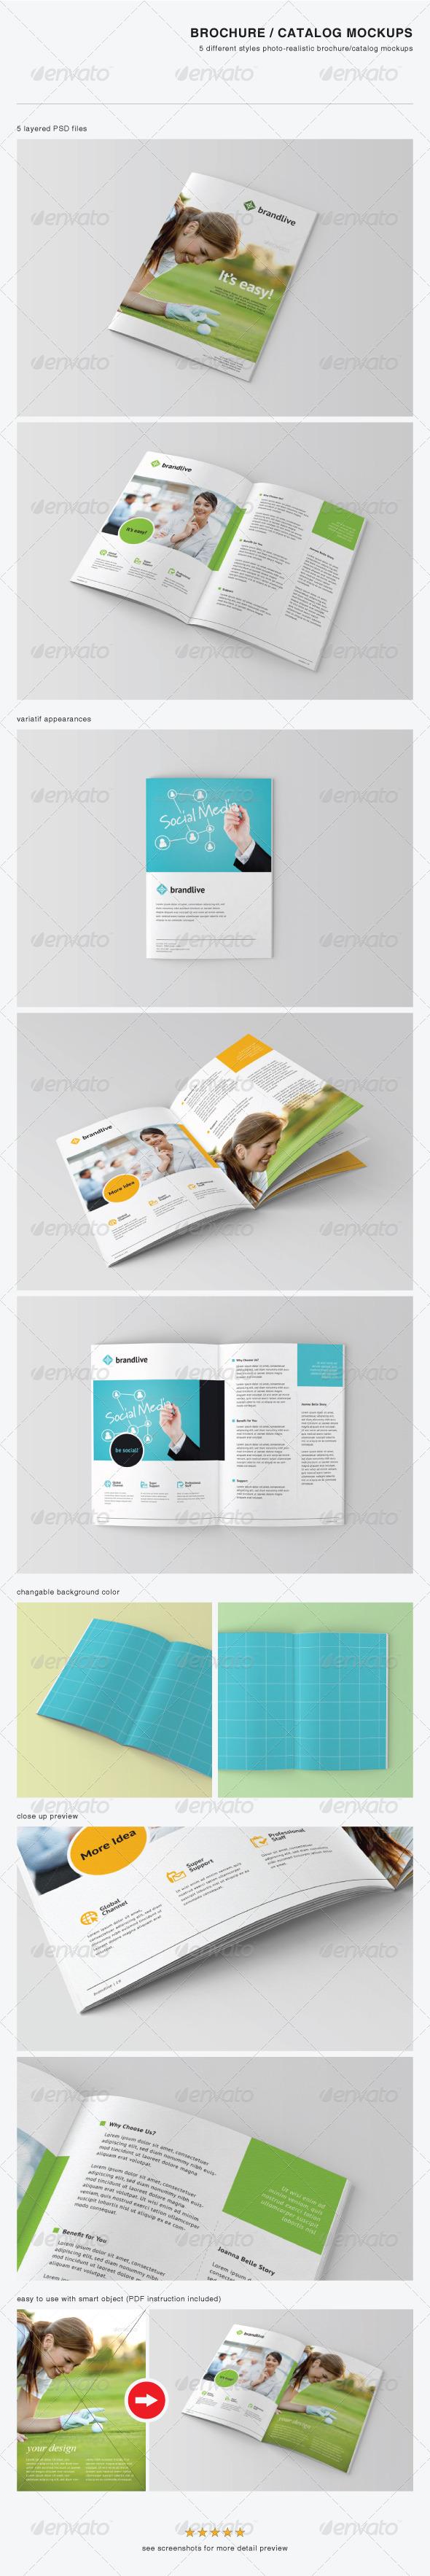 GraphicRiver Brochure Catalog Mockups 3441425